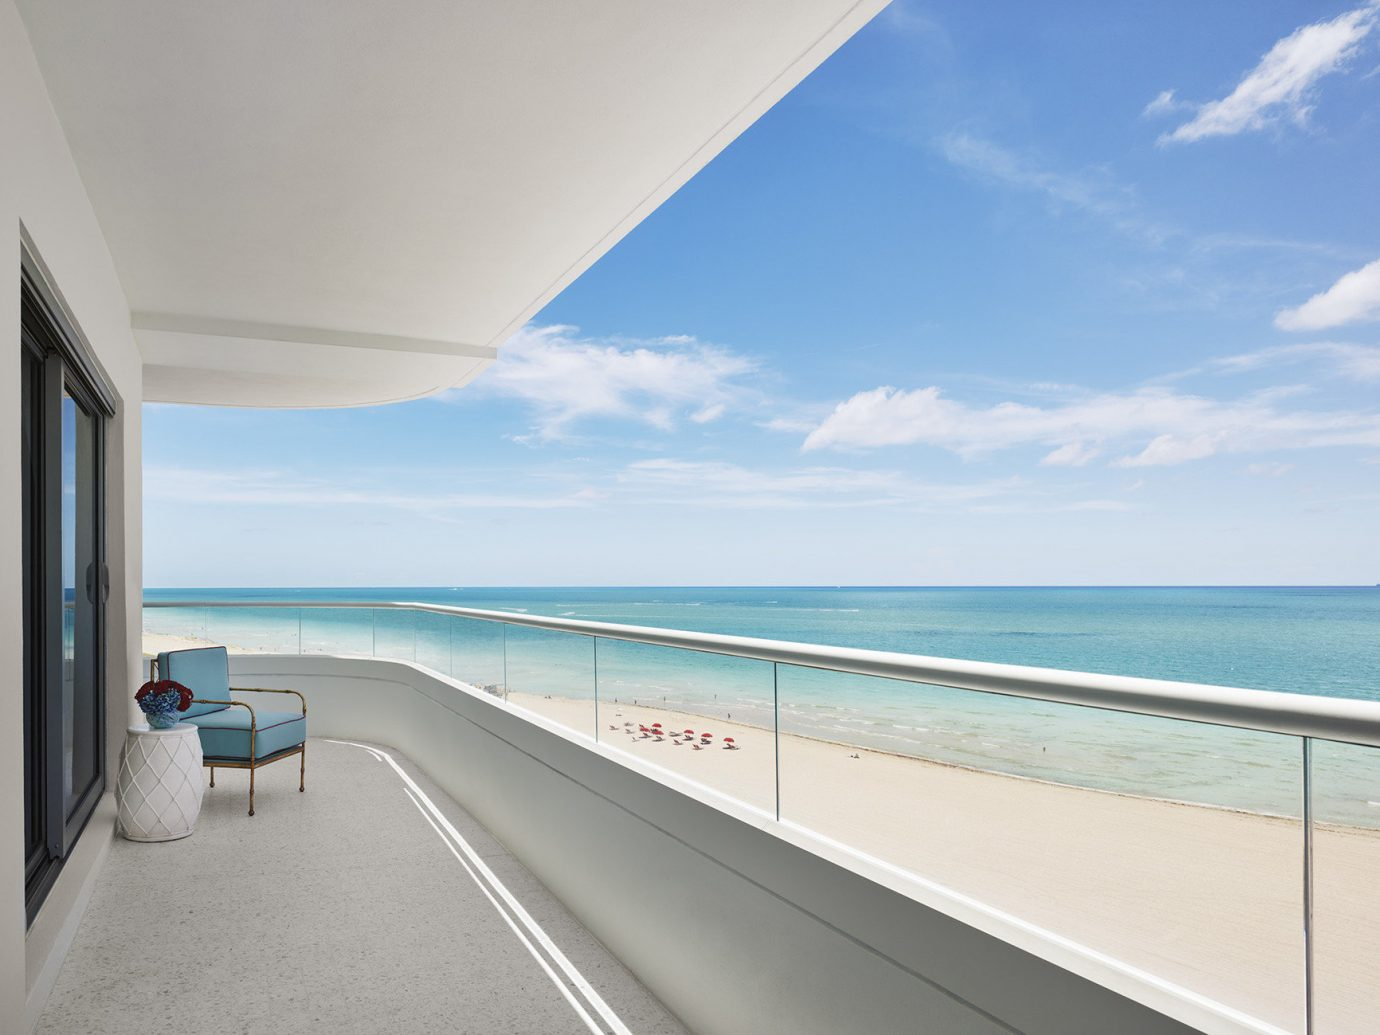 Trip Ideas sky property Ocean Sea vacation horizon Beach house caribbean shore Coast home estate swimming pool bay condominium apartment overlooking